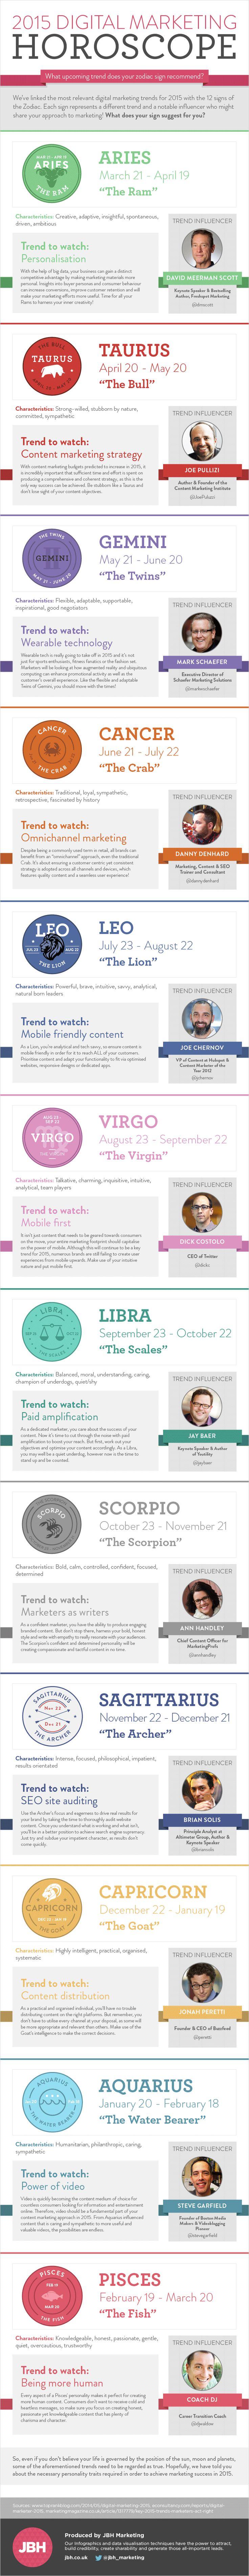 2015 #DigitalMarketing Horoscope - #infographic #contentmarketing